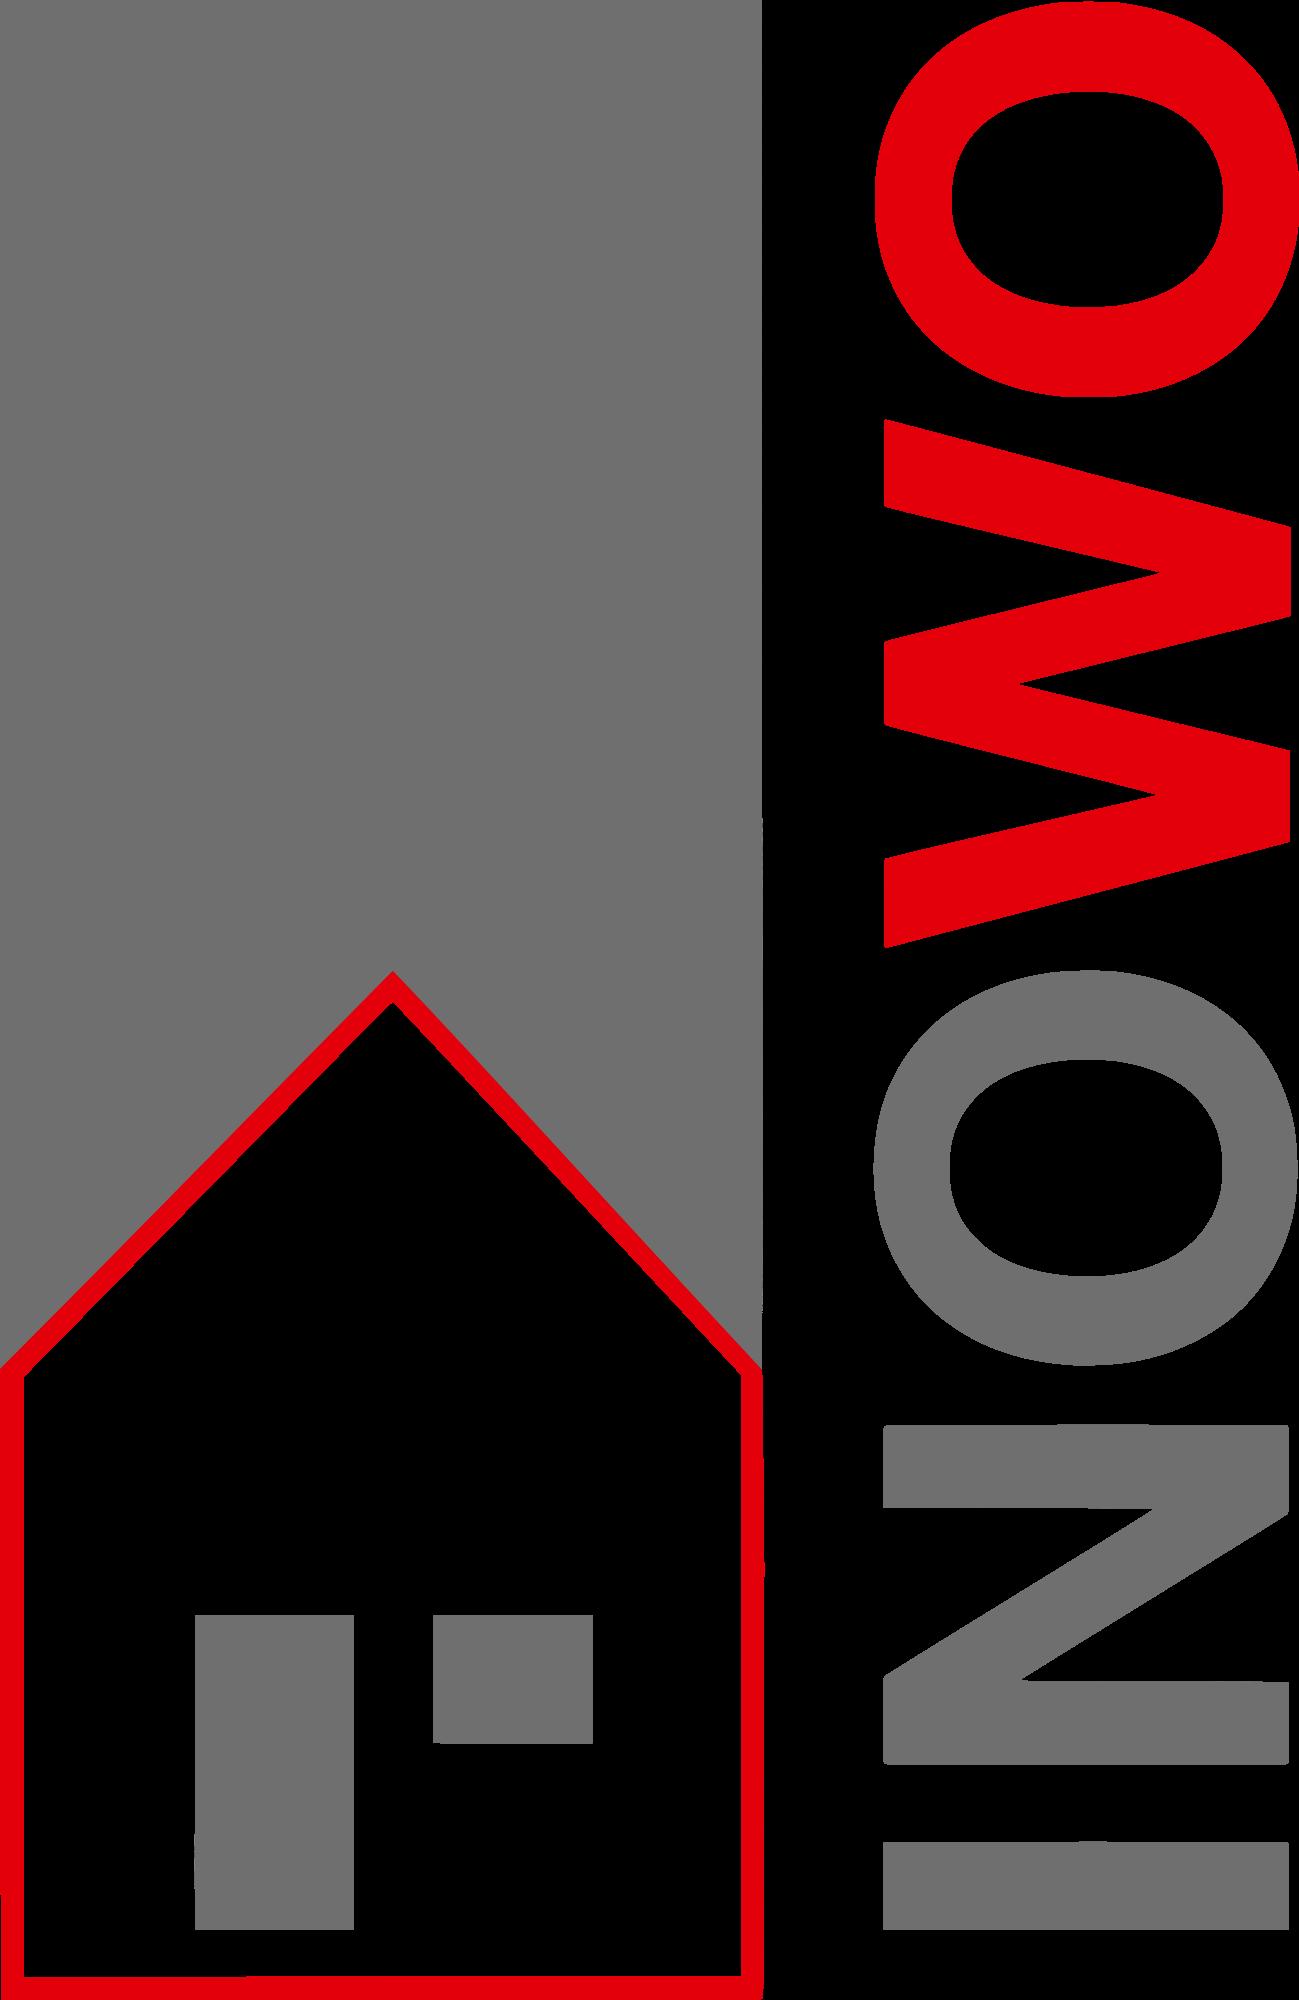 INOWO GmbH & Co. KG